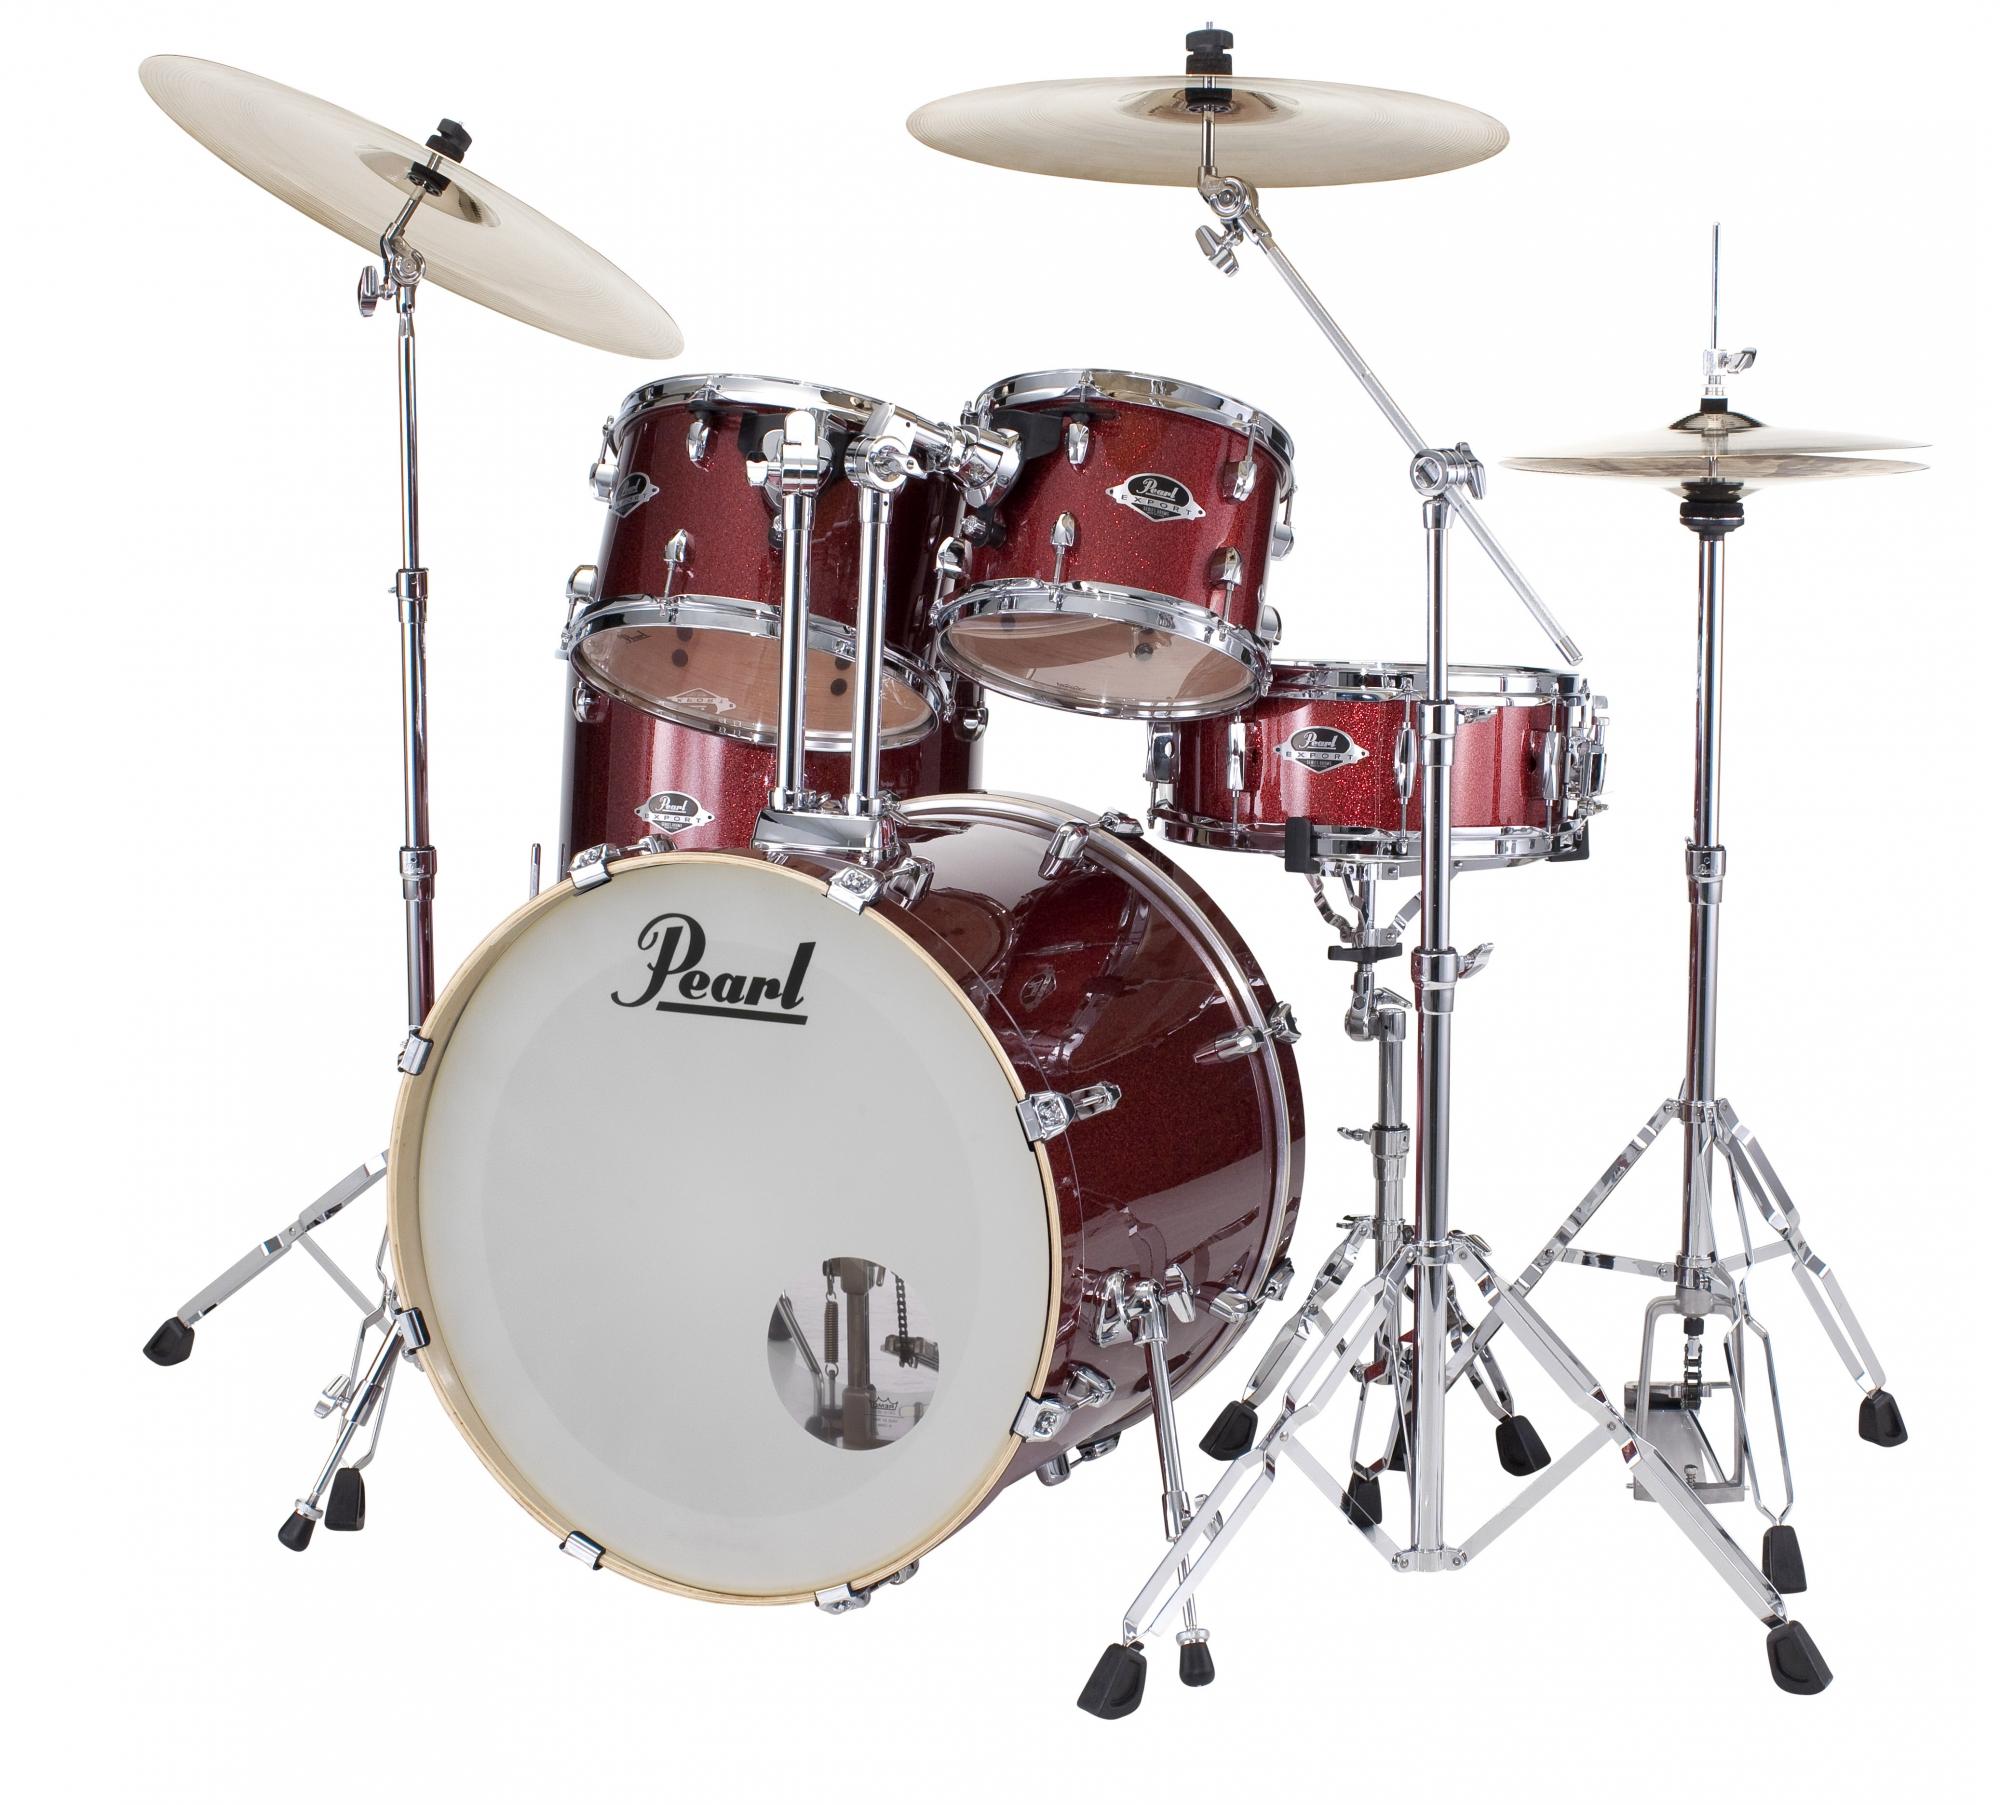 Billede af Pearl Export EXX Fusion Trommesæt Black Cherry Glitter